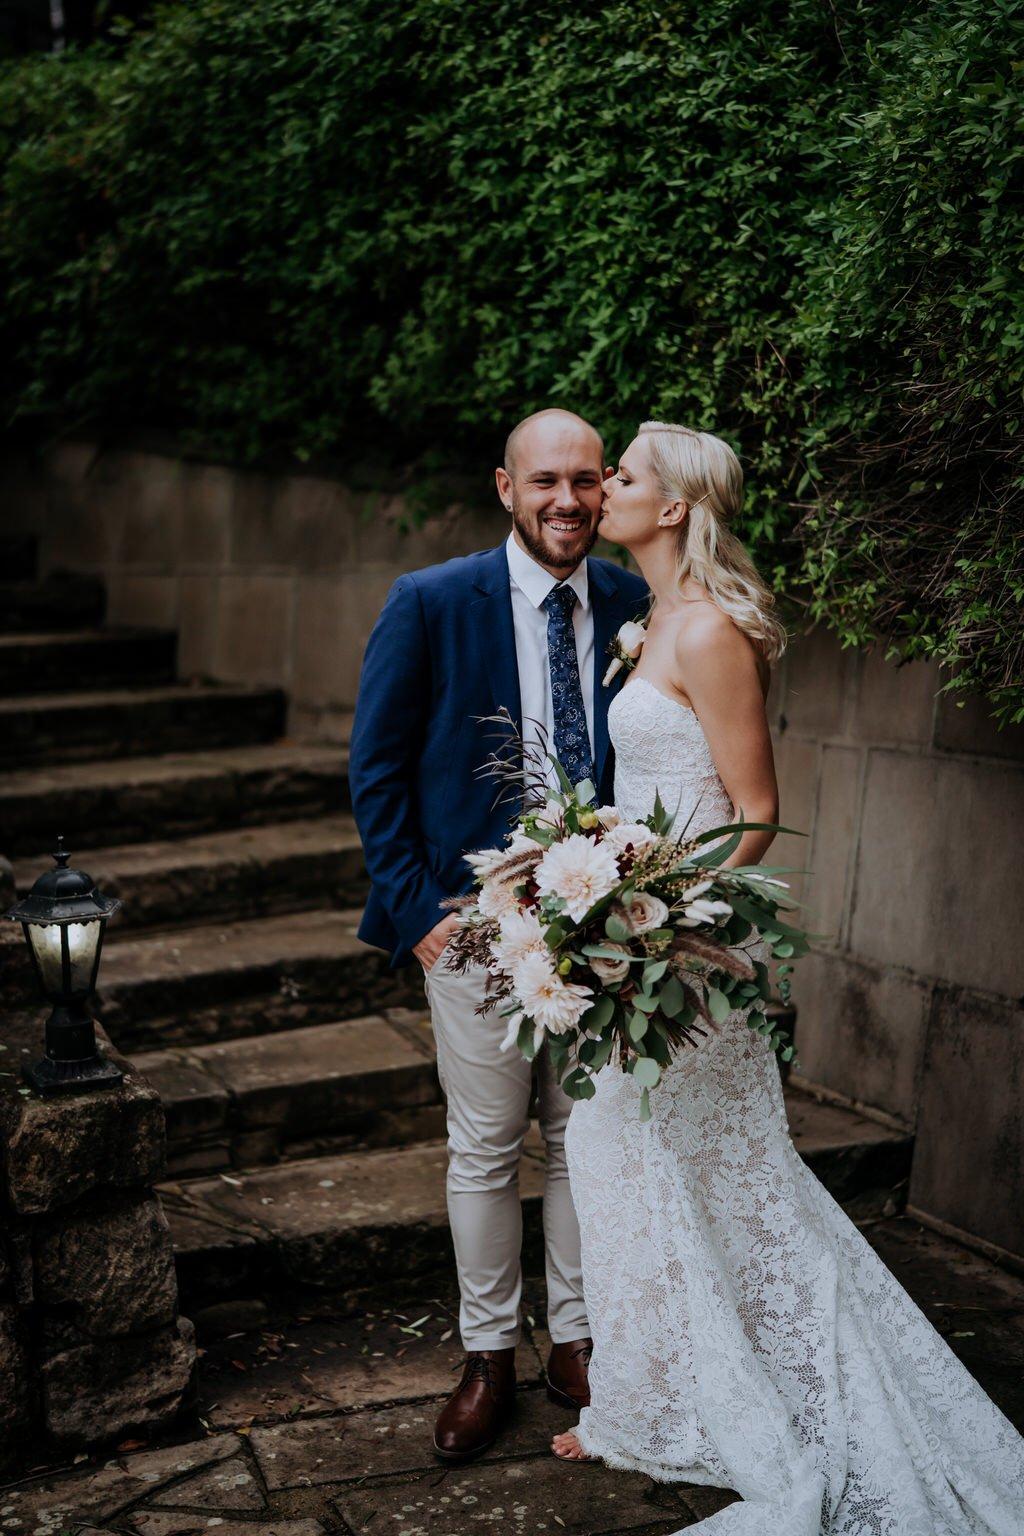 ava-me-photography-jade-simon-loxley-bellbird-hill-kurrajong-heights-wedding-682